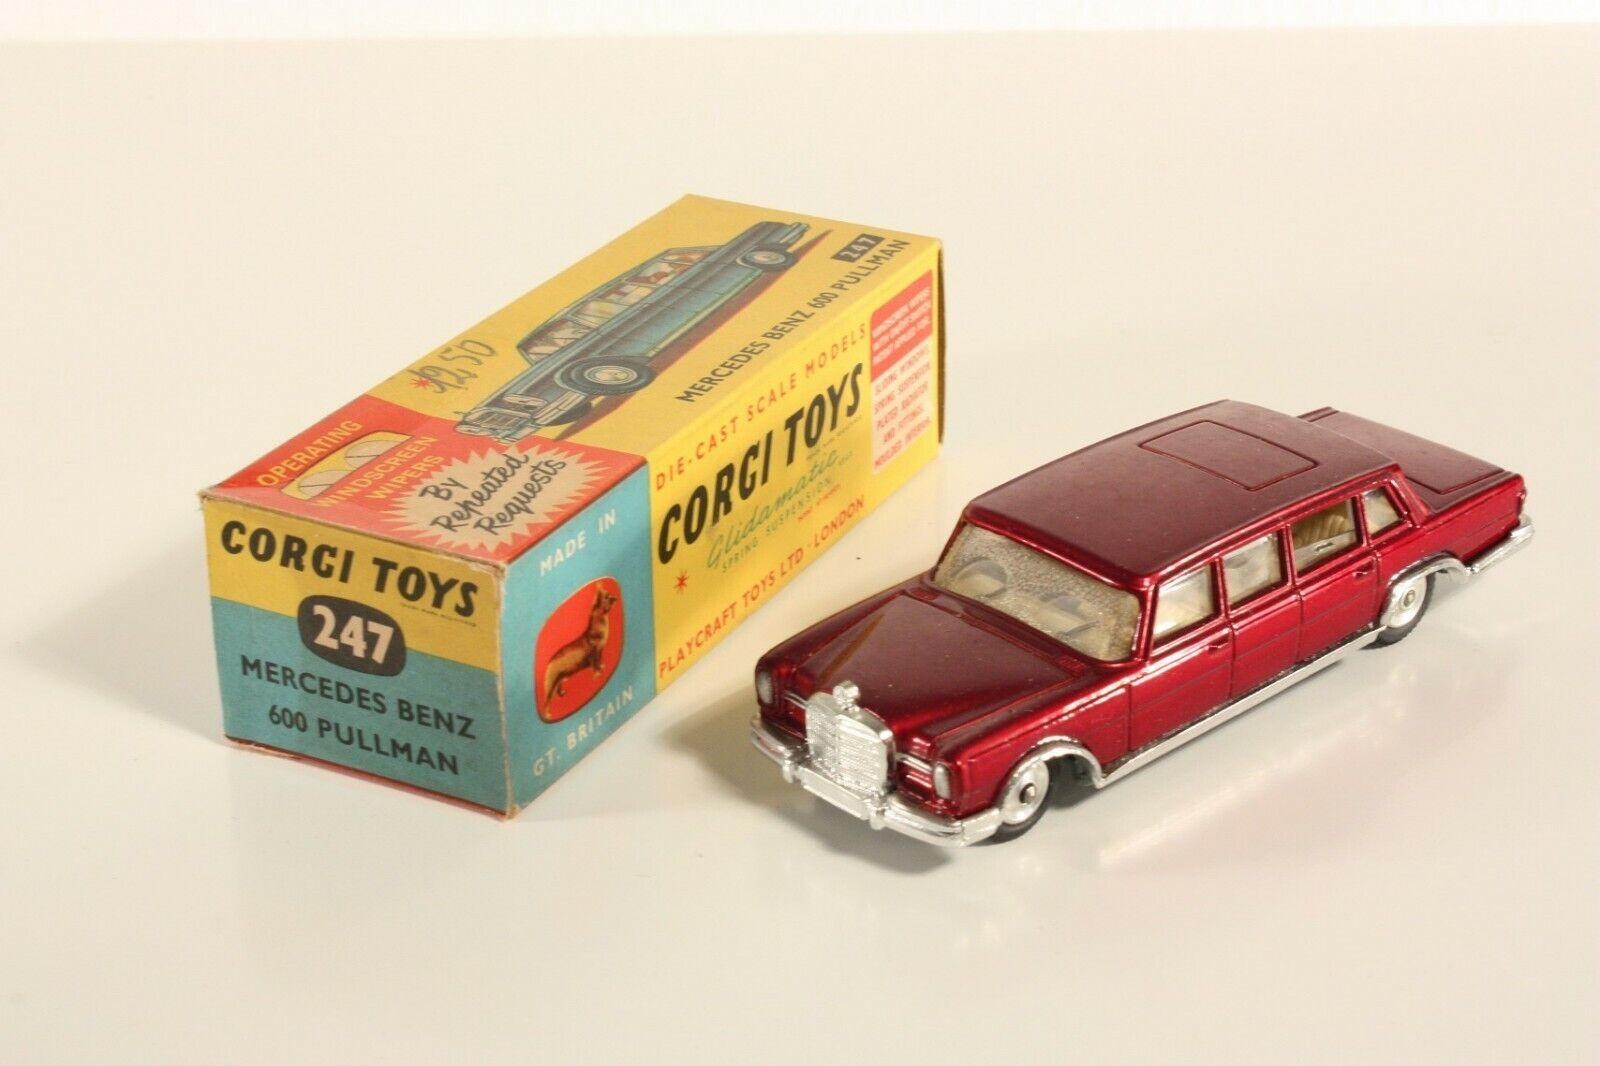 Corgi Toys 247, Mercedes Benz 600 Pullman, Mint in Box                    ab2203